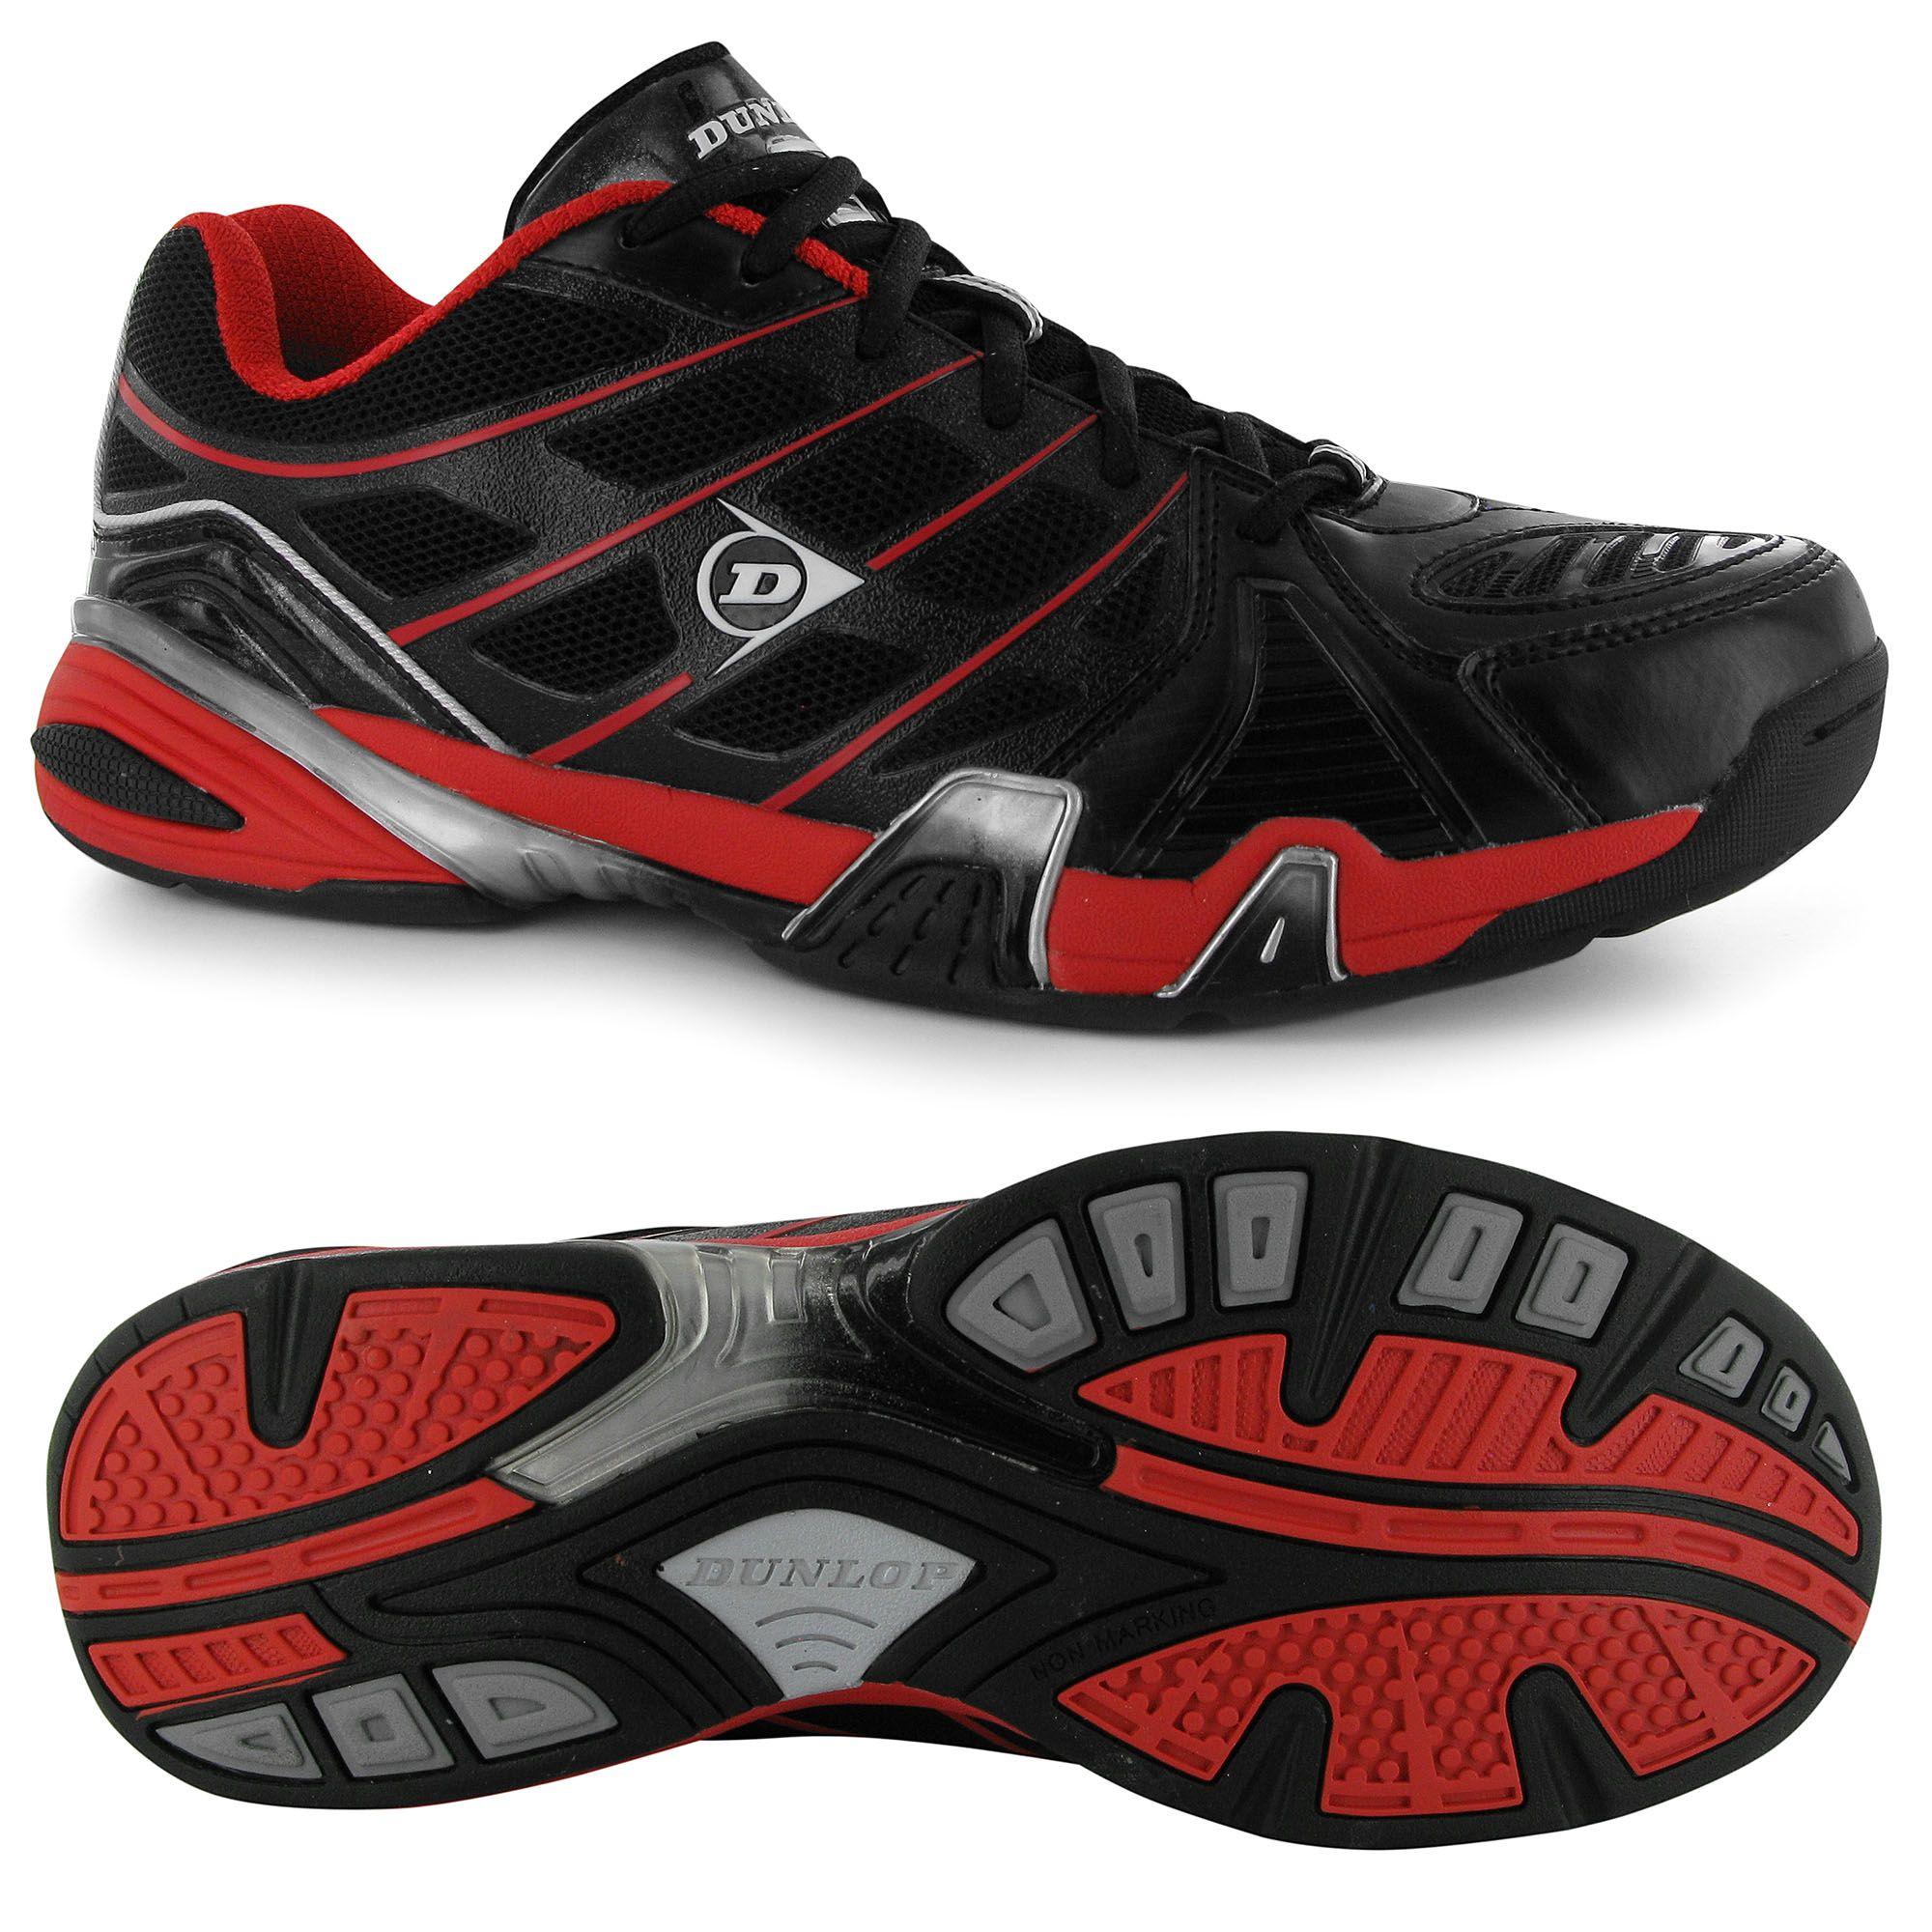 Dunlop Rapid Inferno Mens Court Shoes Sweatband Com